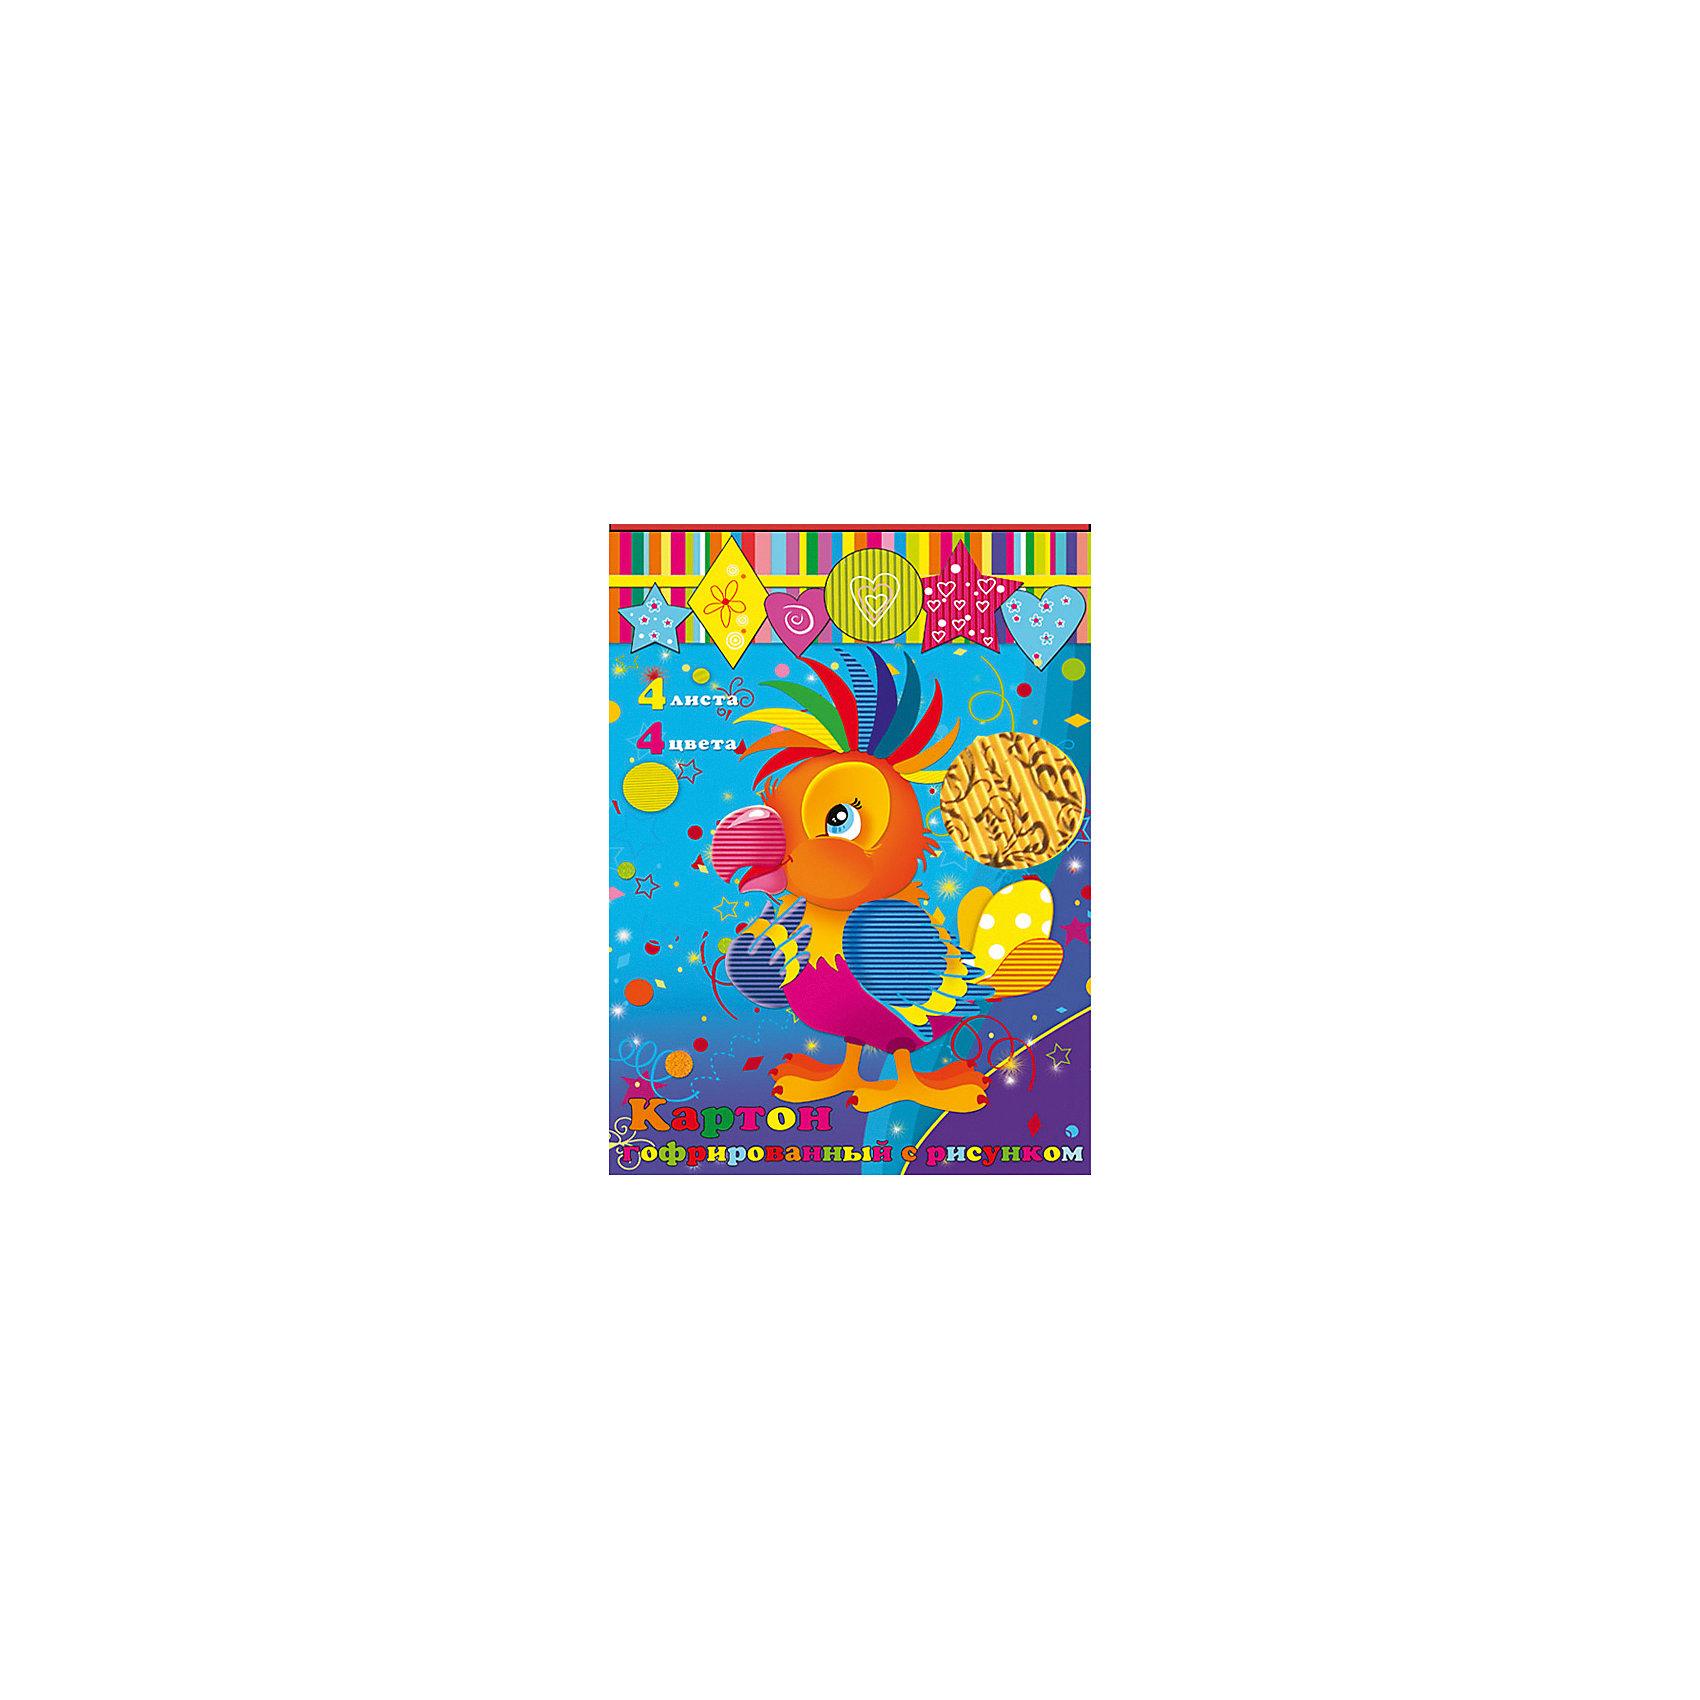 Феникс+ Картон гофрированный, 4 листа феникс гофрированный картон для хобби и рукоделия радужный 4 листа